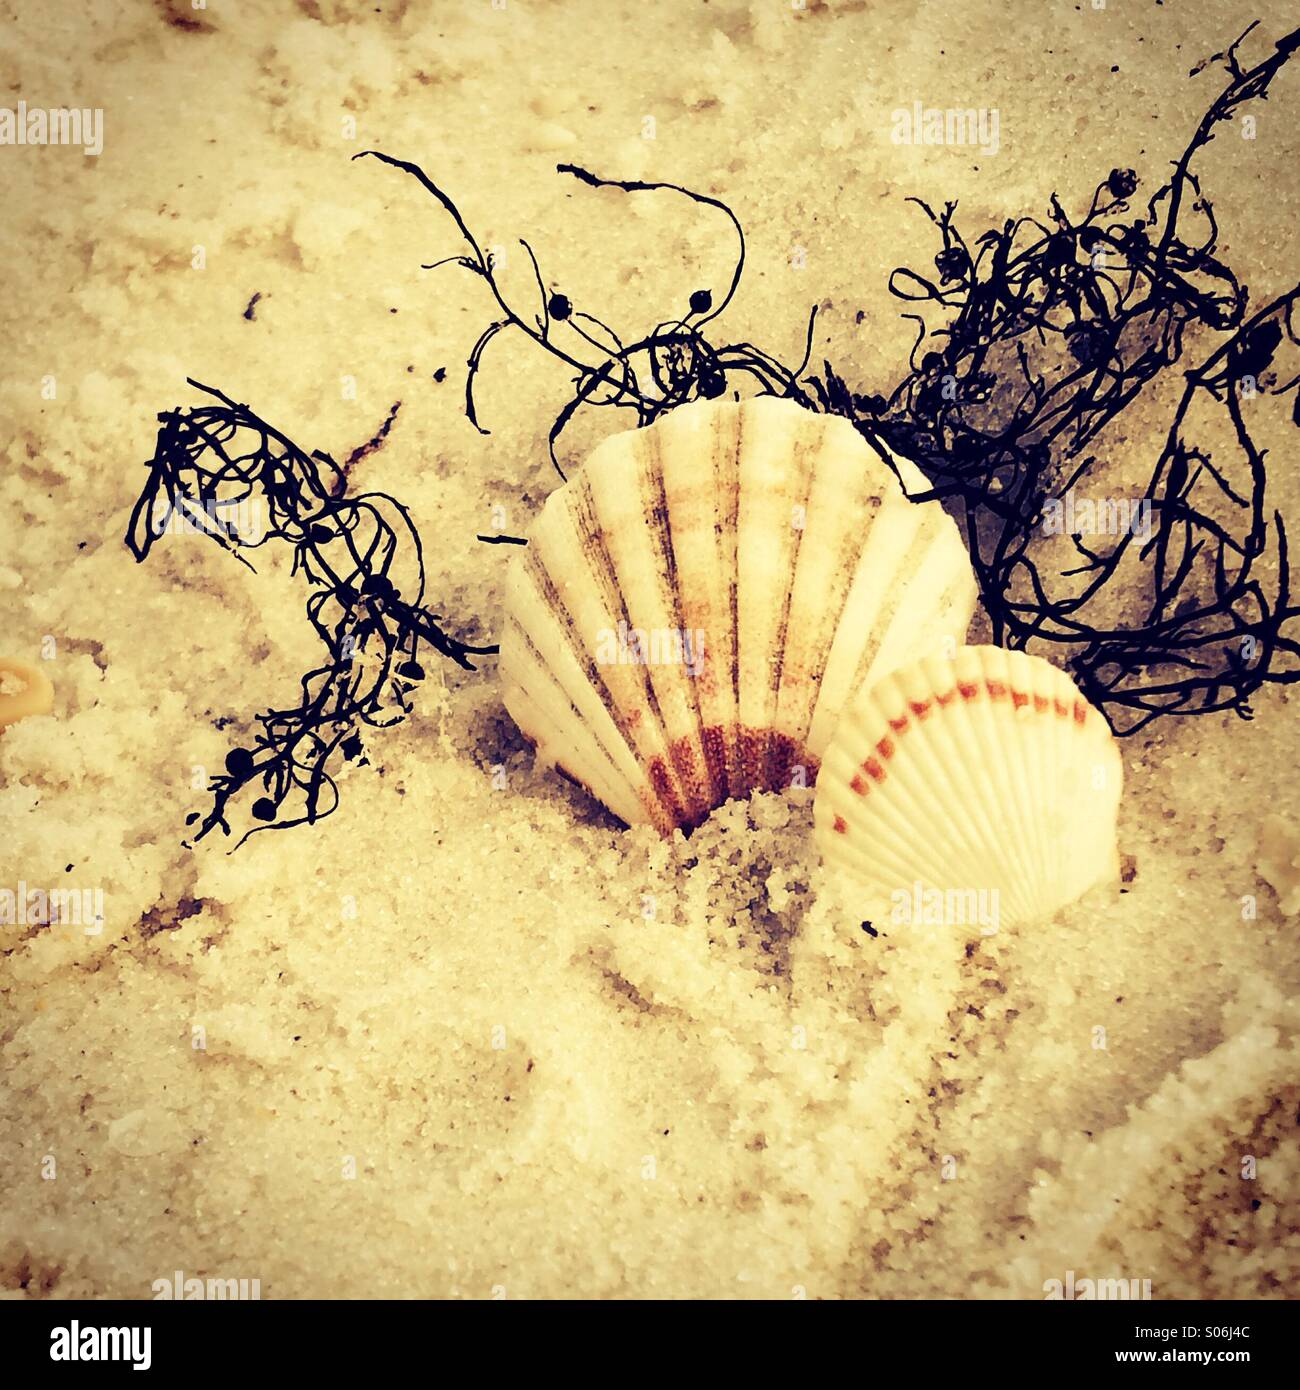 Shell dance - Stock Image